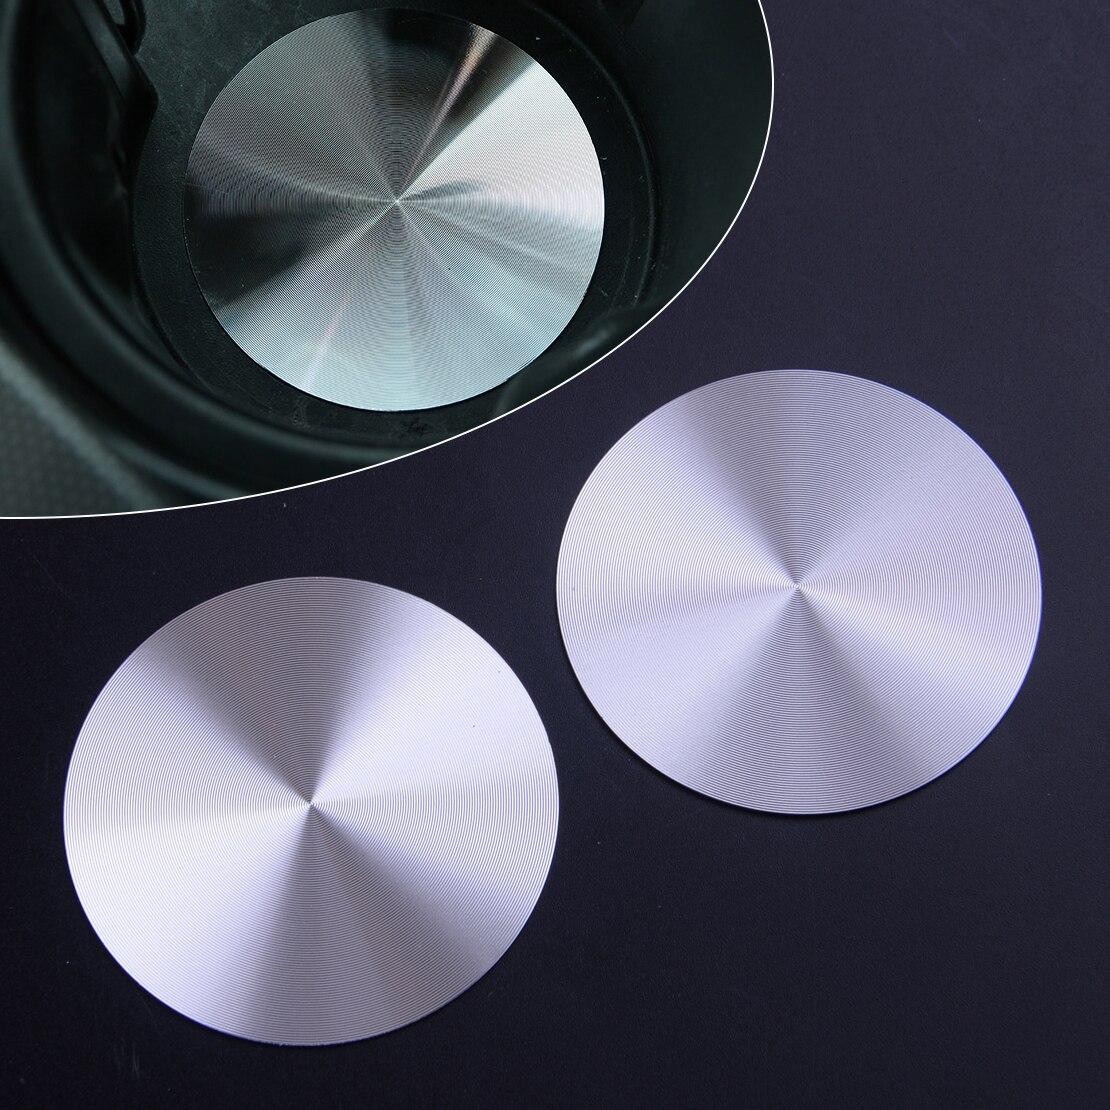 Beler 2 uds aleación de aluminio Interior copa de agua ranura para...